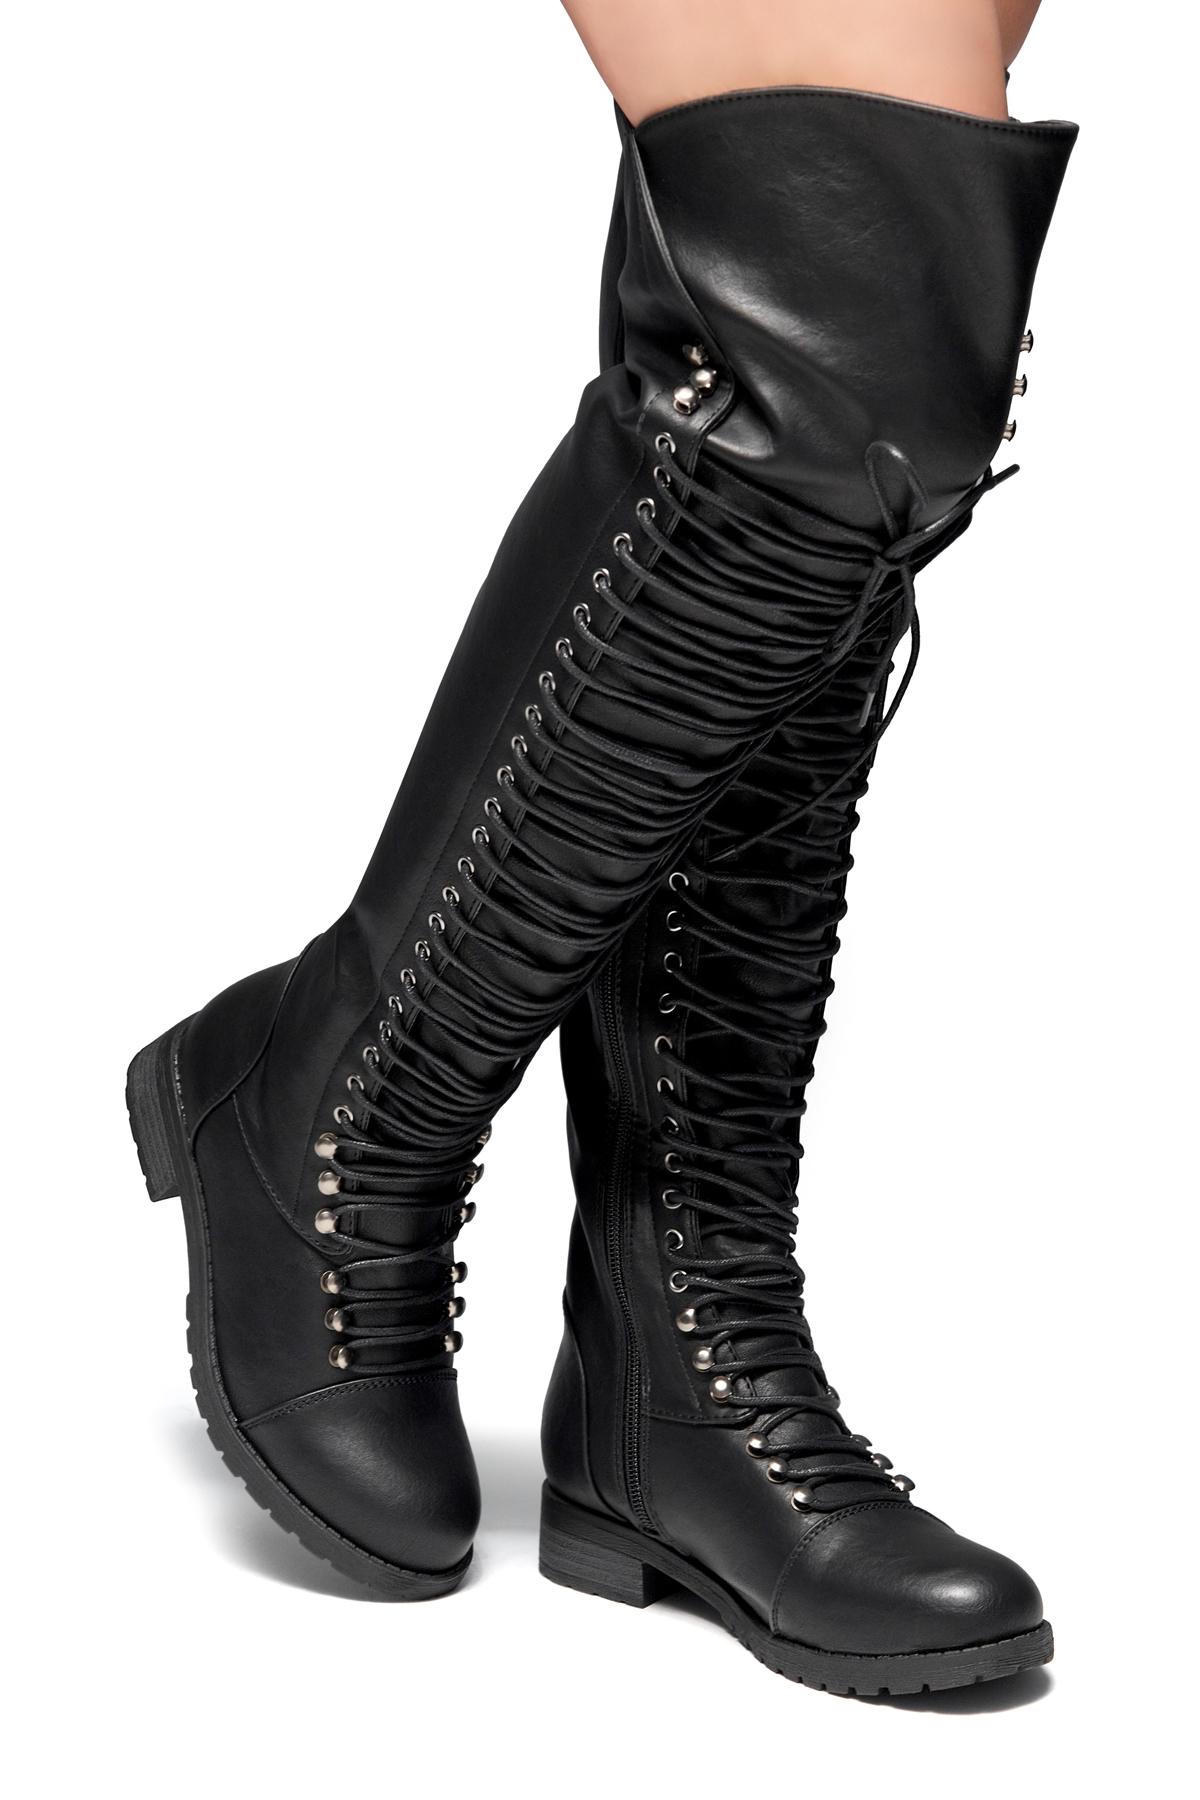 c9e65af90ba HerStyle Kristrrina-Combat Lace up Over-The-Knee Boots(Black)